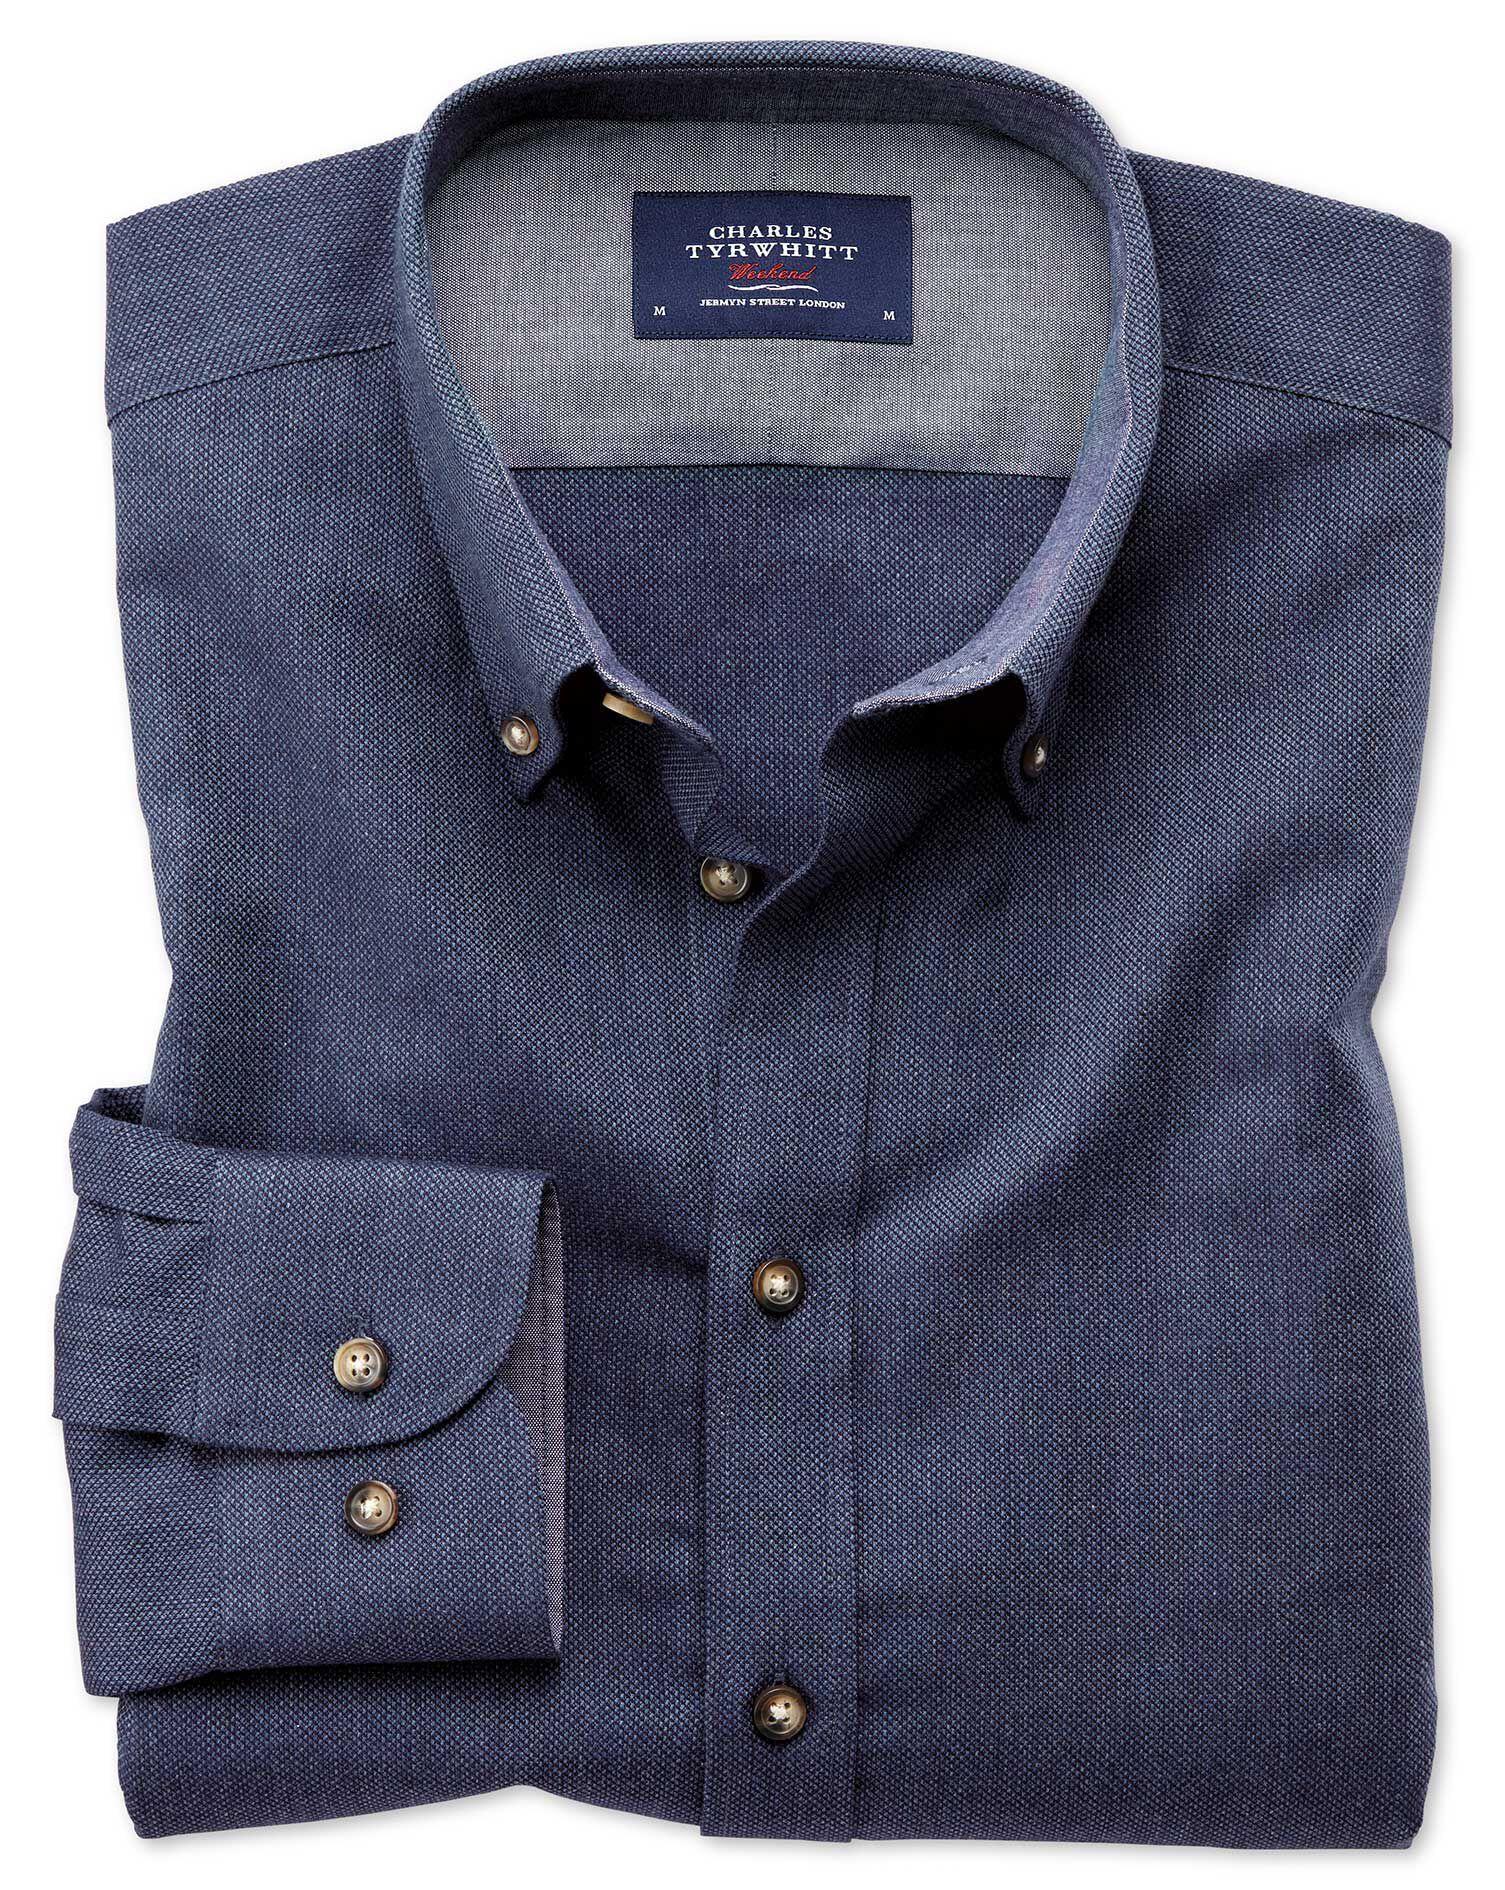 Slim Fit Button-Down Soft Cotton Plain Blue Shirt Single Cuff Size XS by Charles Tyrwhitt